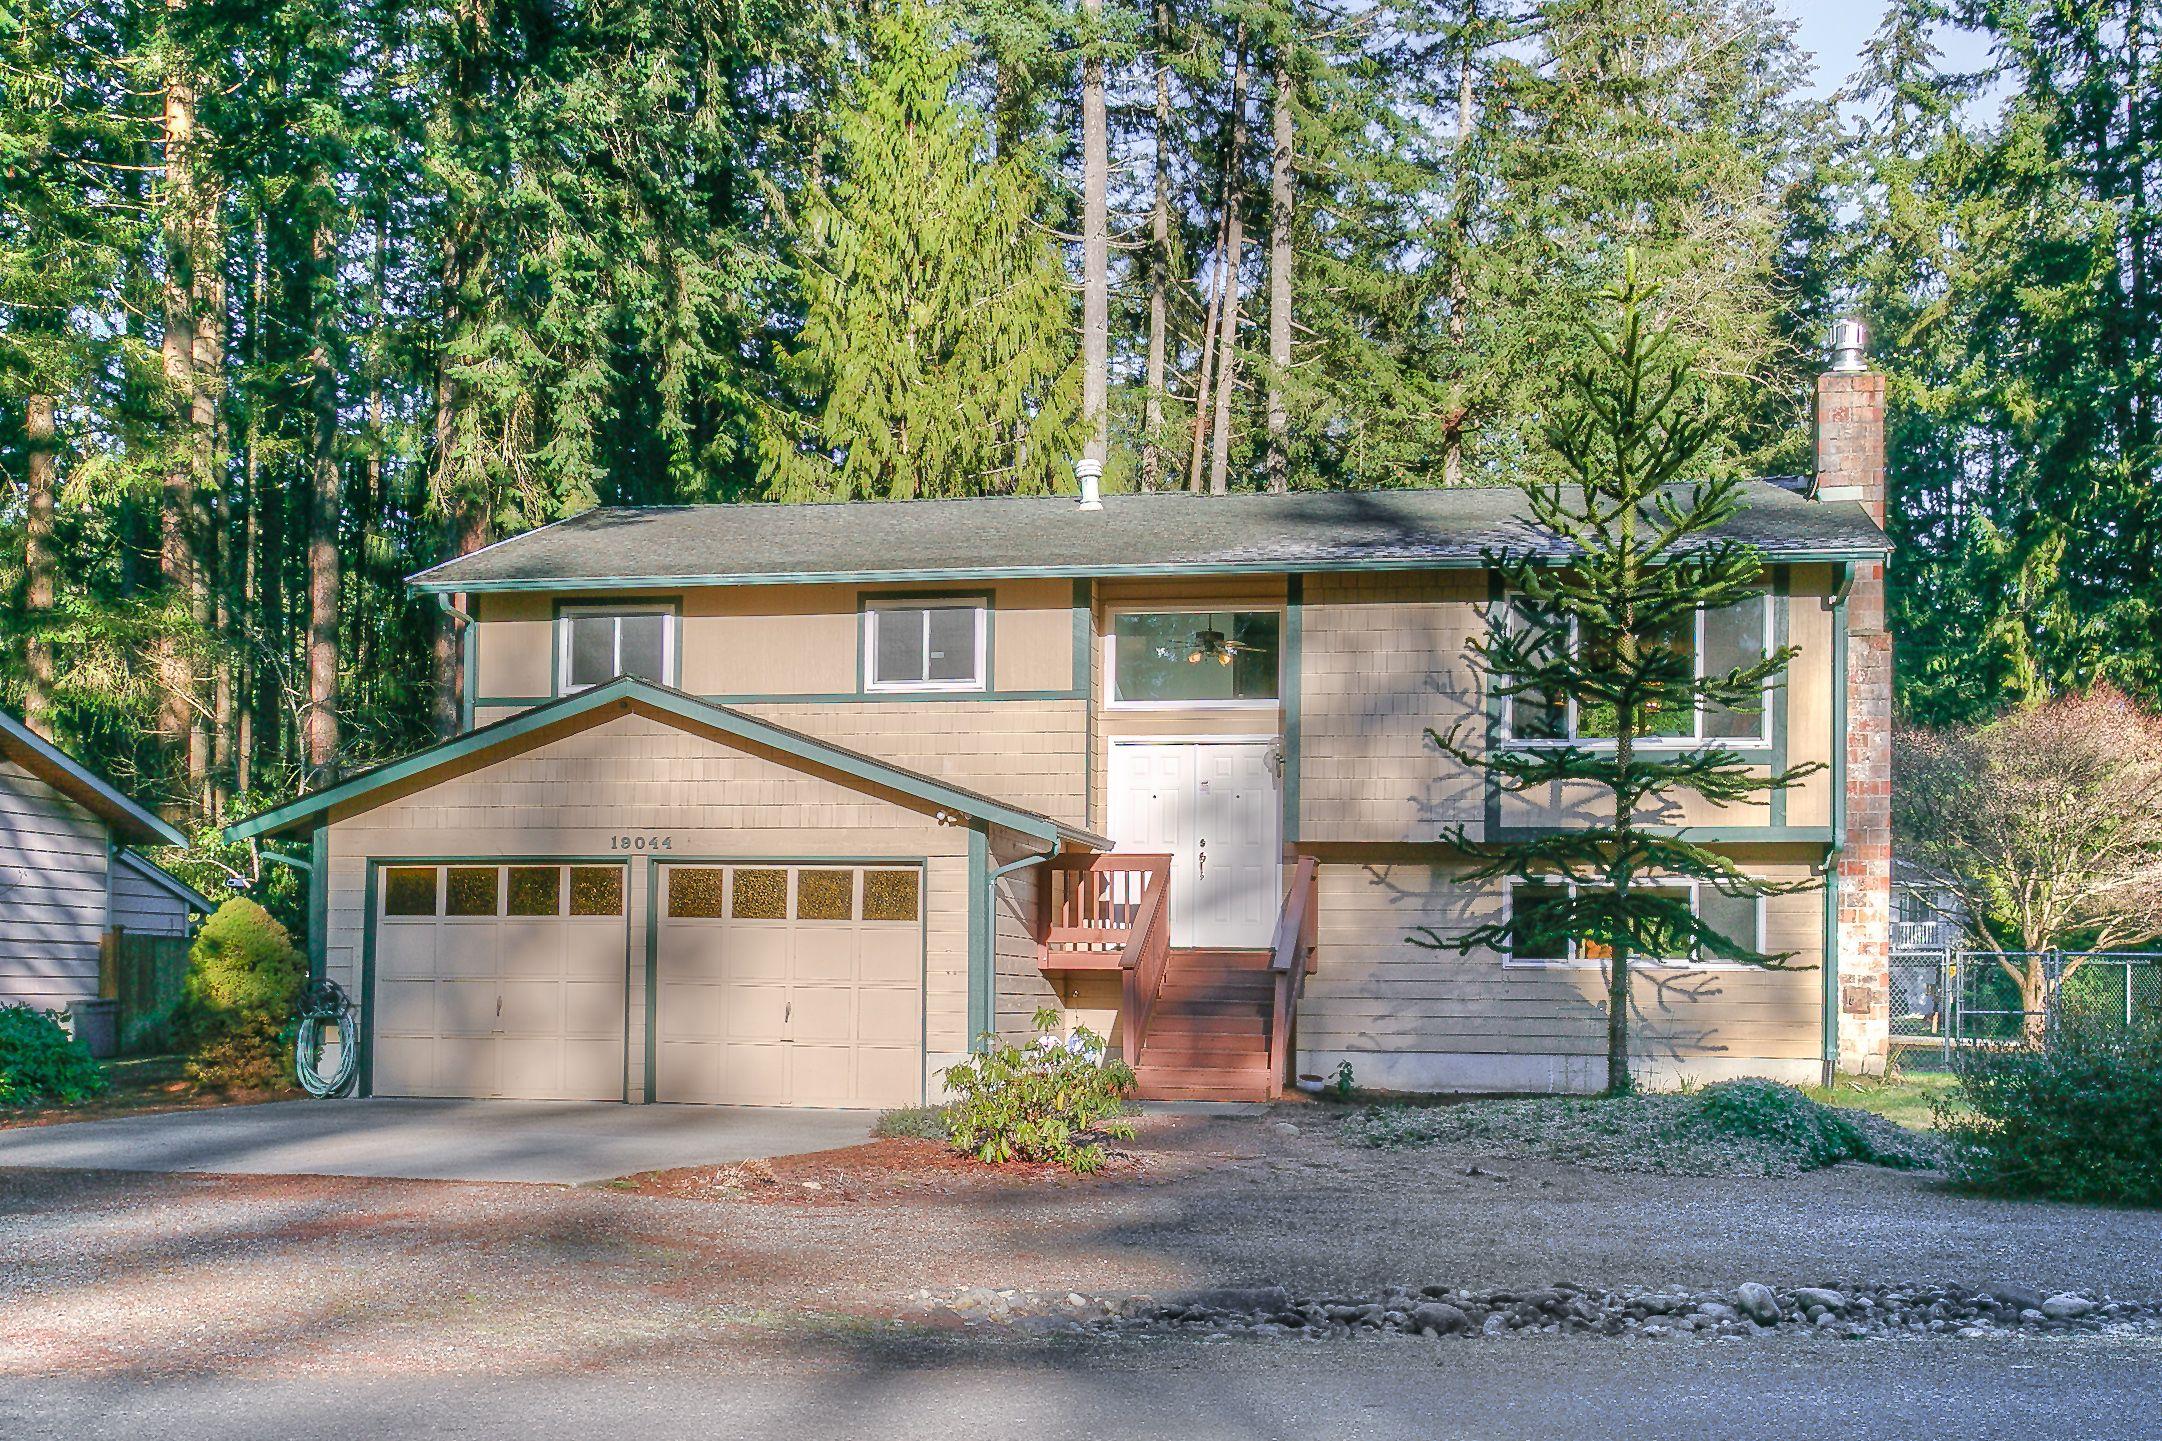 Cottage lake beach club private lake access neighborhood